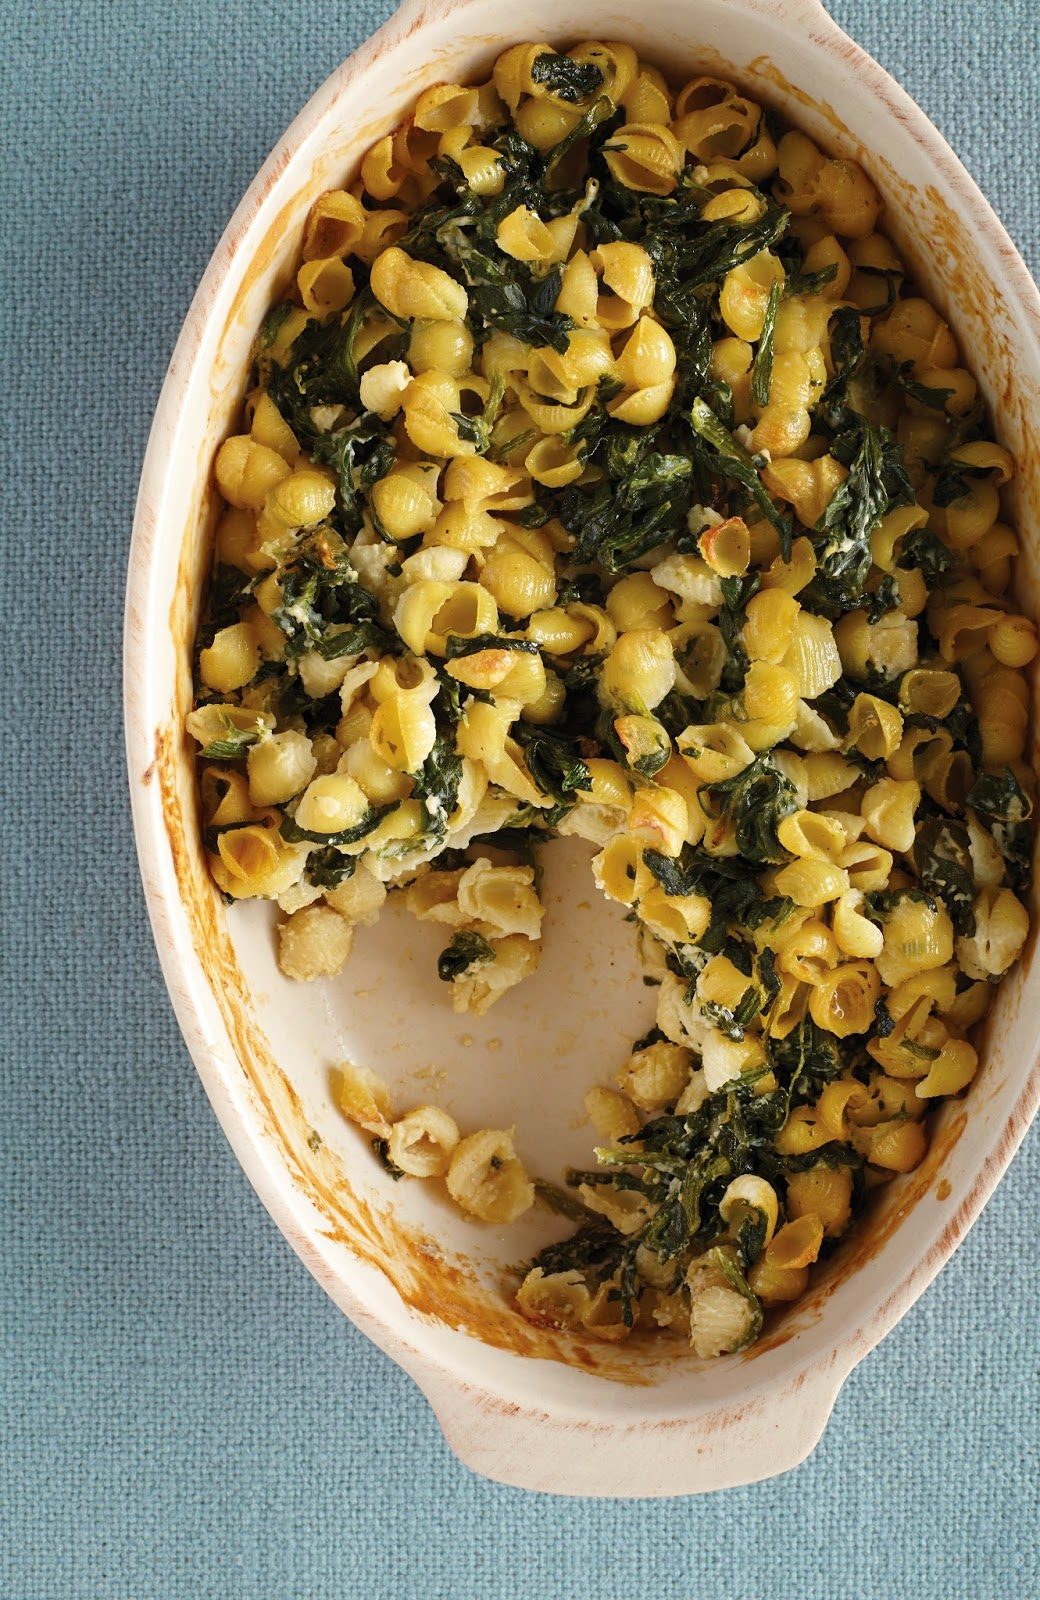 justthefood com   the blog: Julie Hasson's Vegan Casseroles: Book